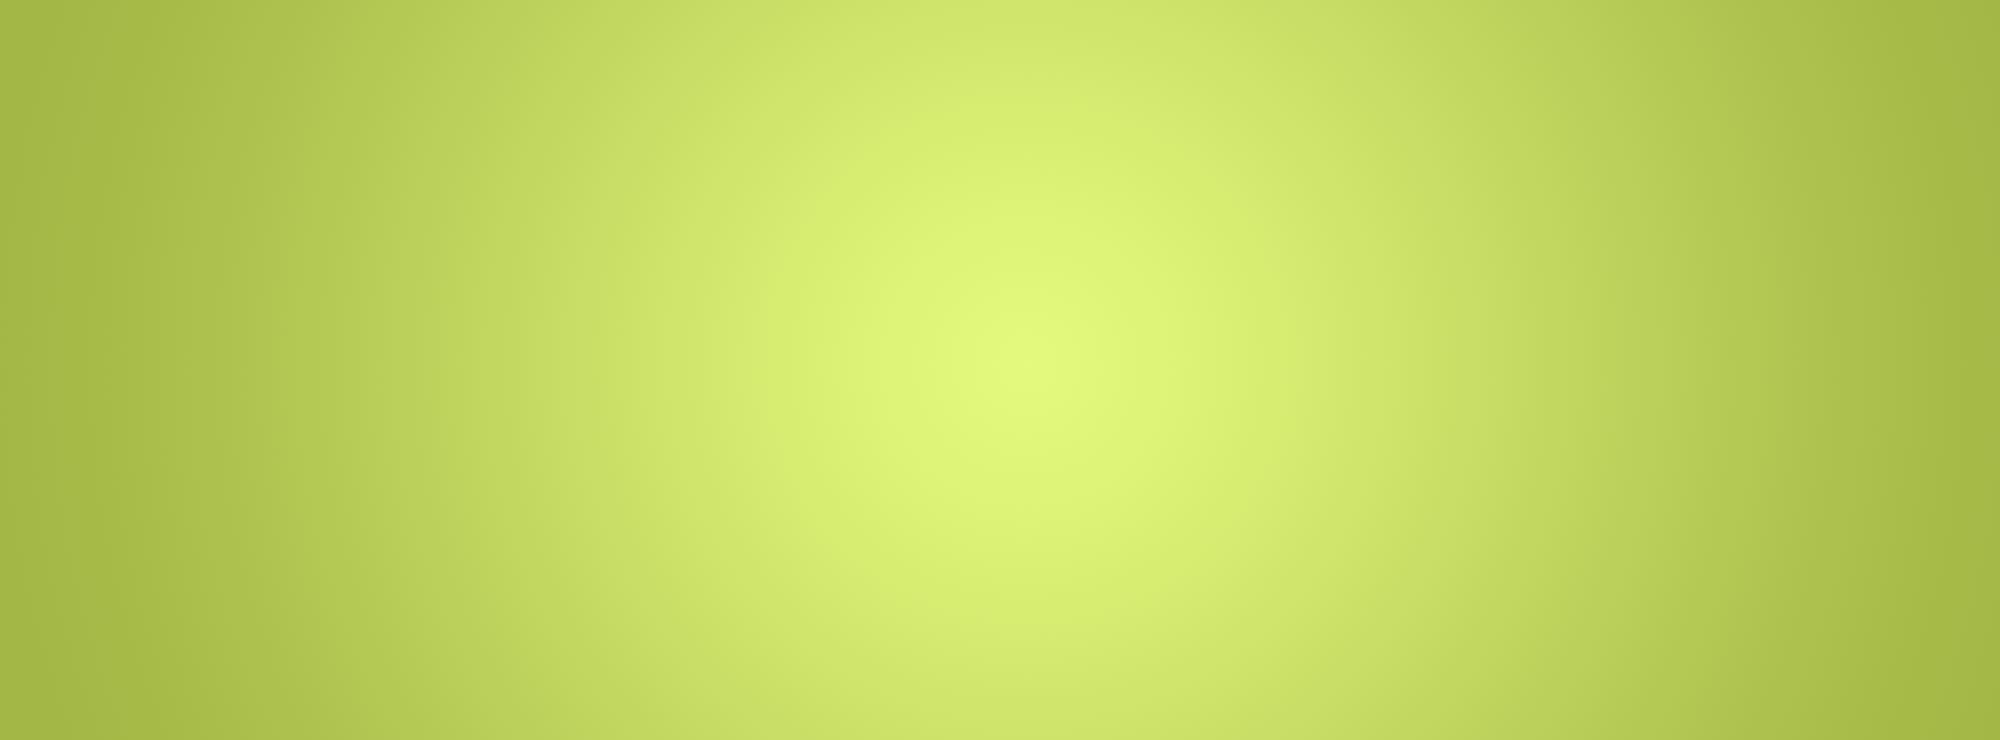 green-back